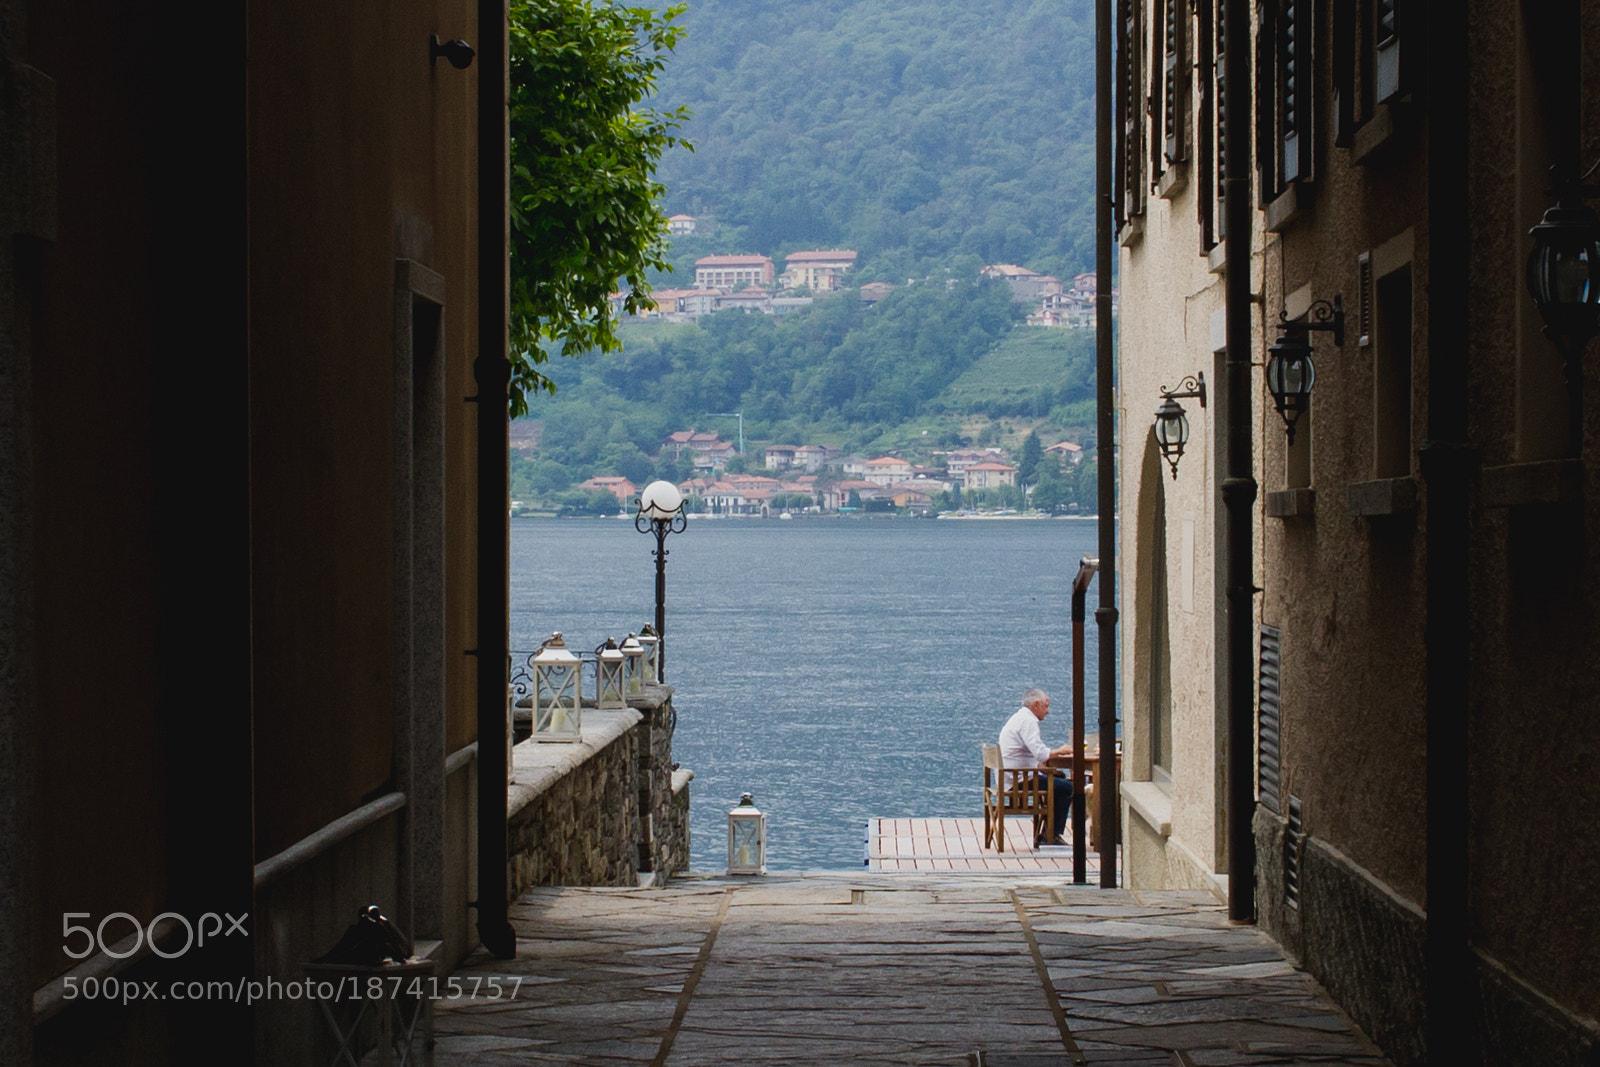 Elder relaxing and enjoying italian lifestyle